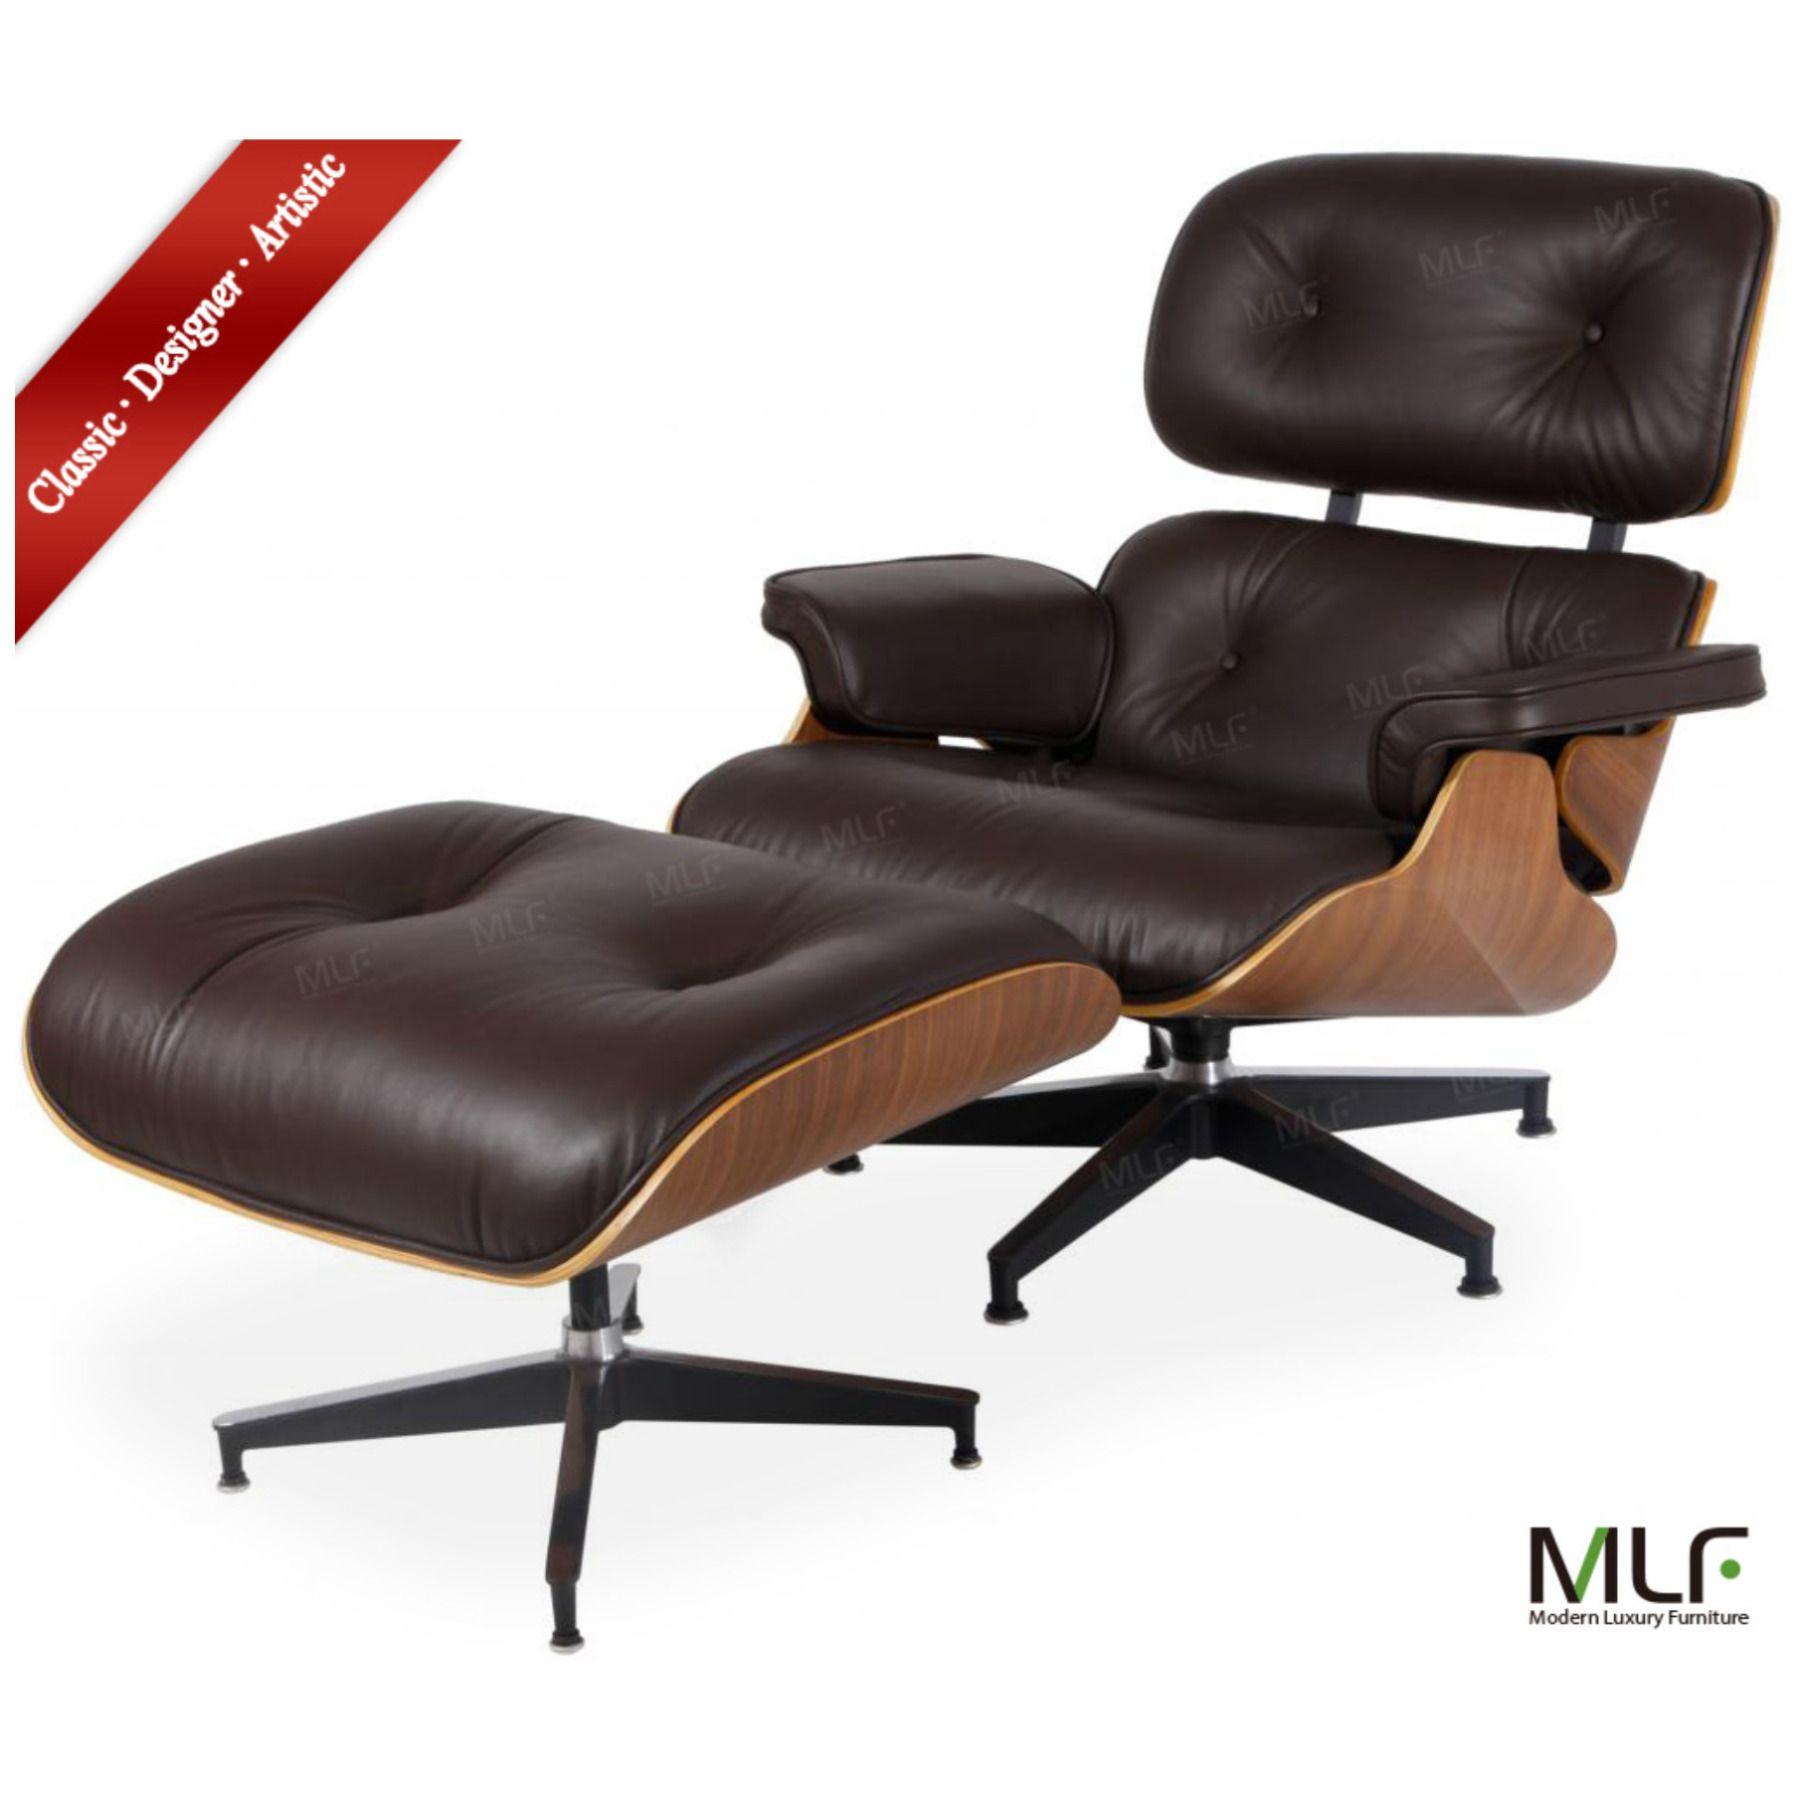 Bon MLF 100% Reproduction Of Eames Lounge Chair U0026 Ottoman, Aniline  Leather+Walnut Laminated